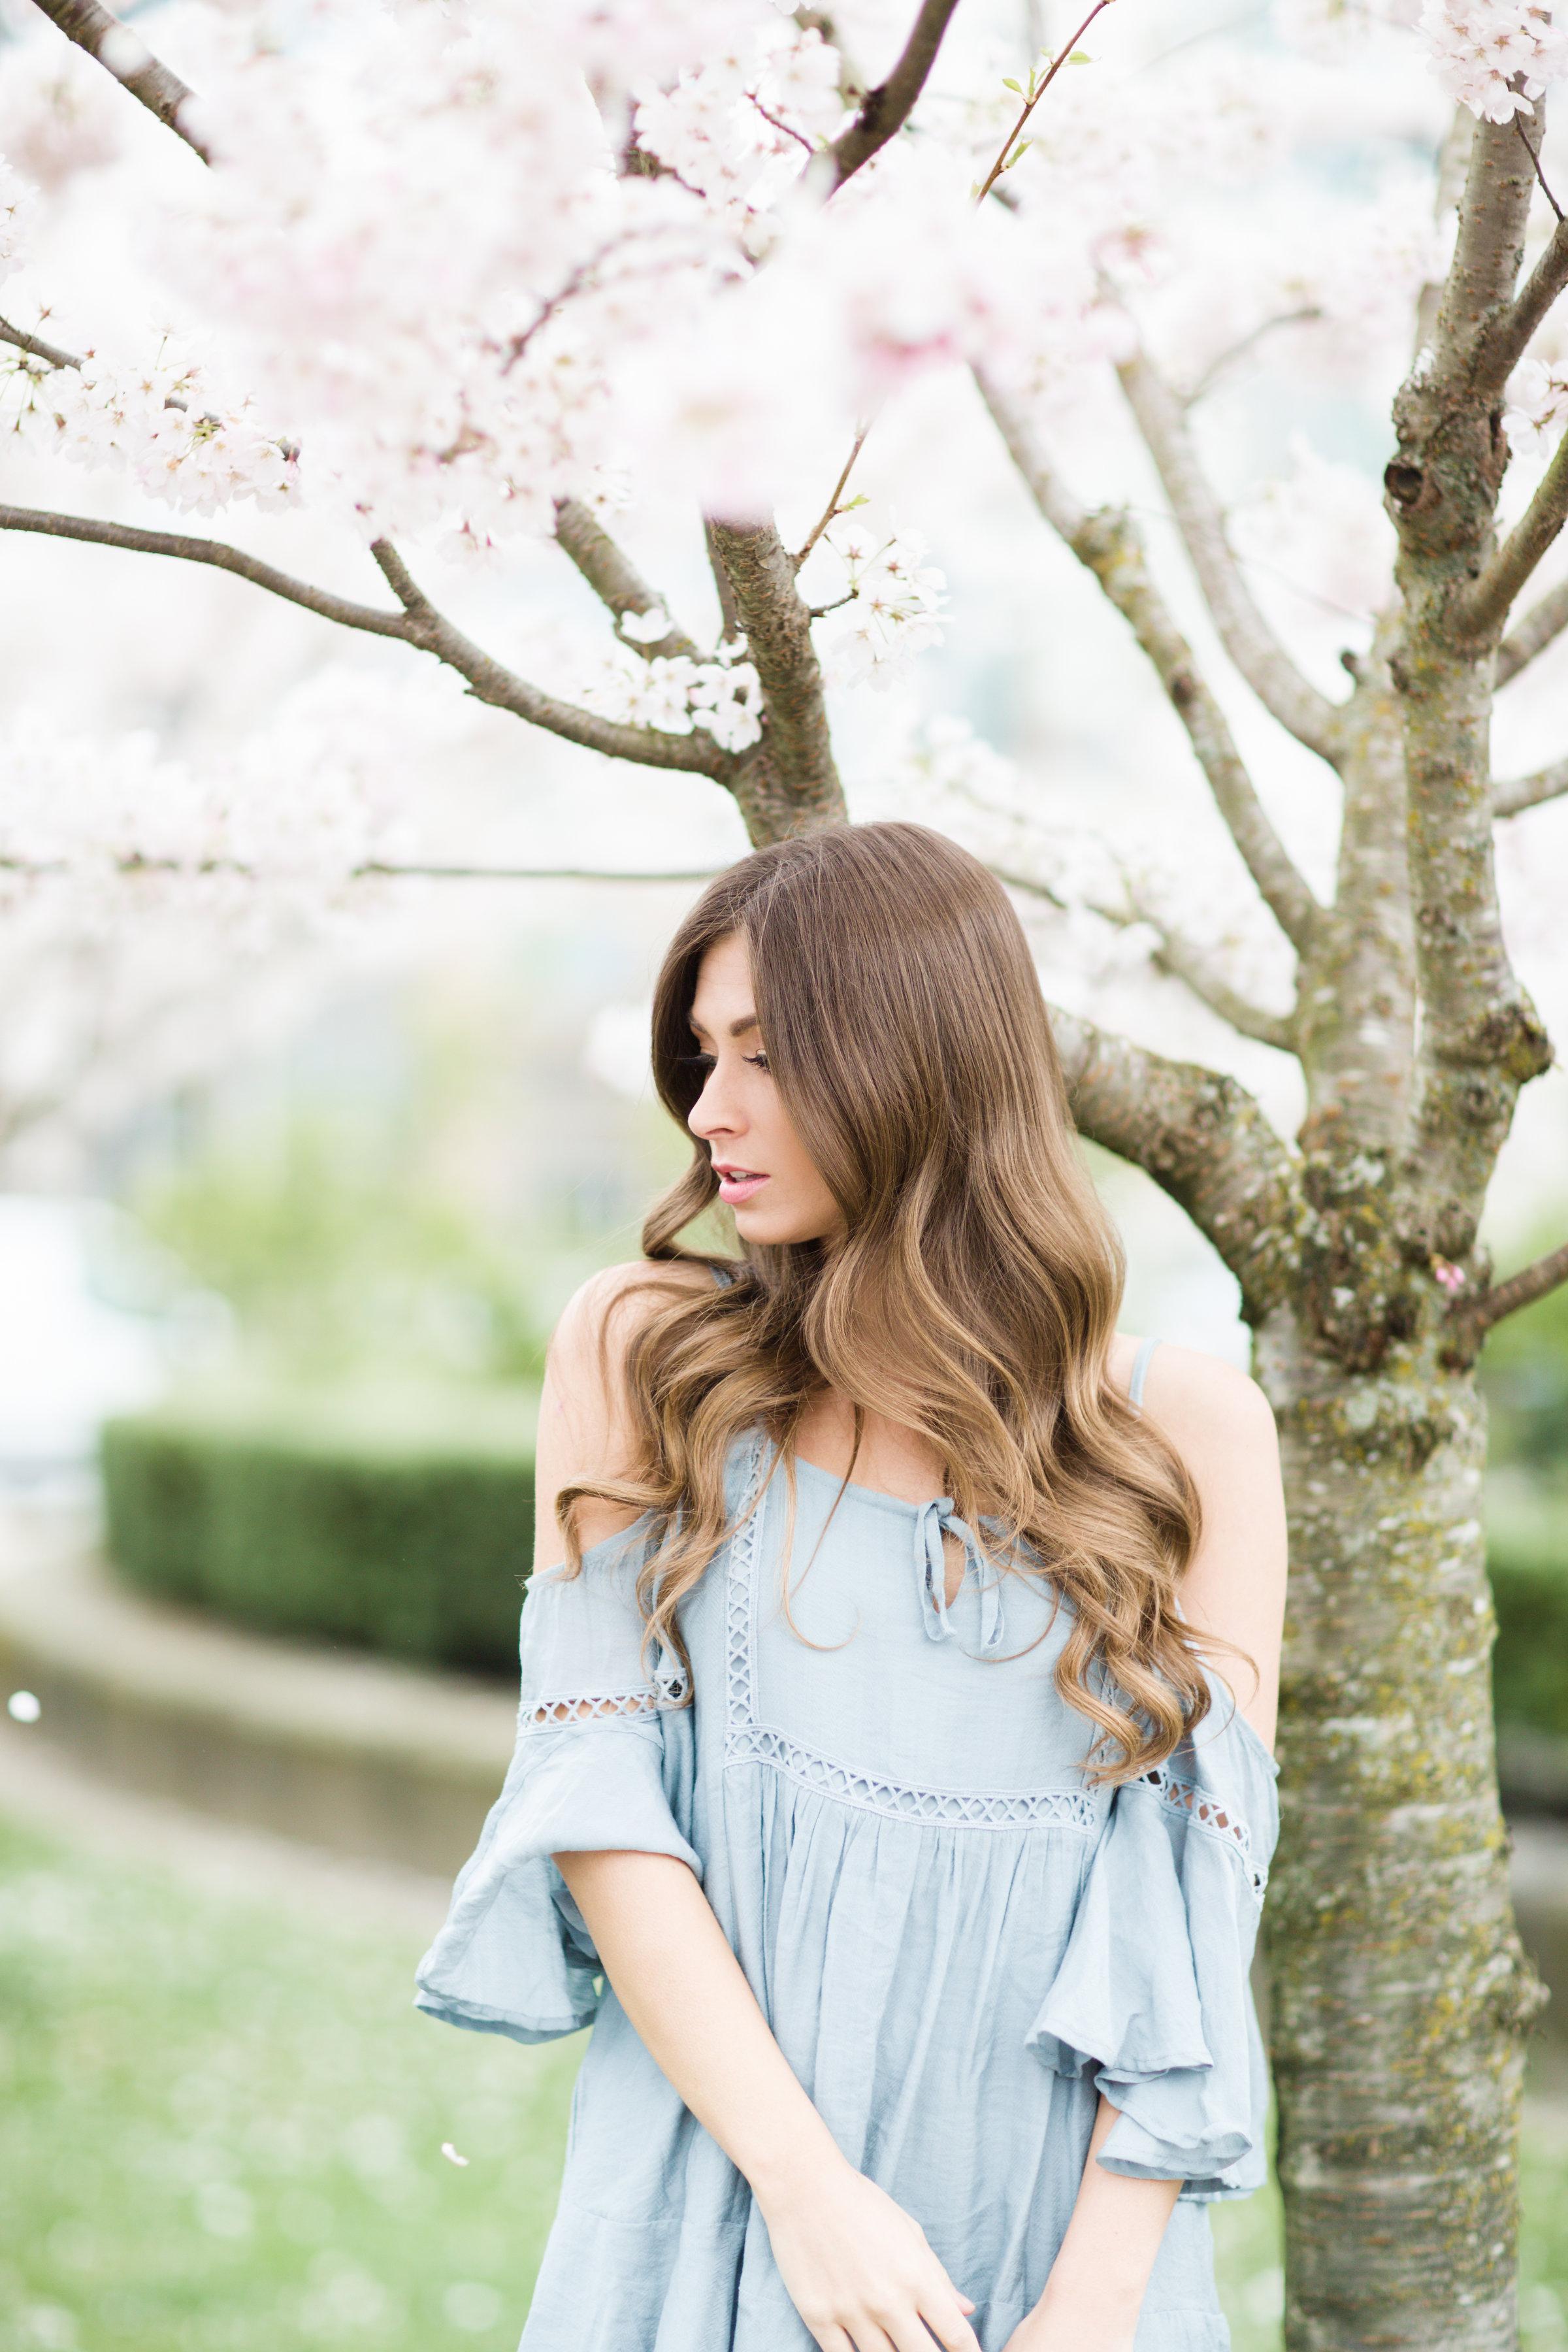 Best Wedding Salon Vancouver   Prép Beauty Parloura